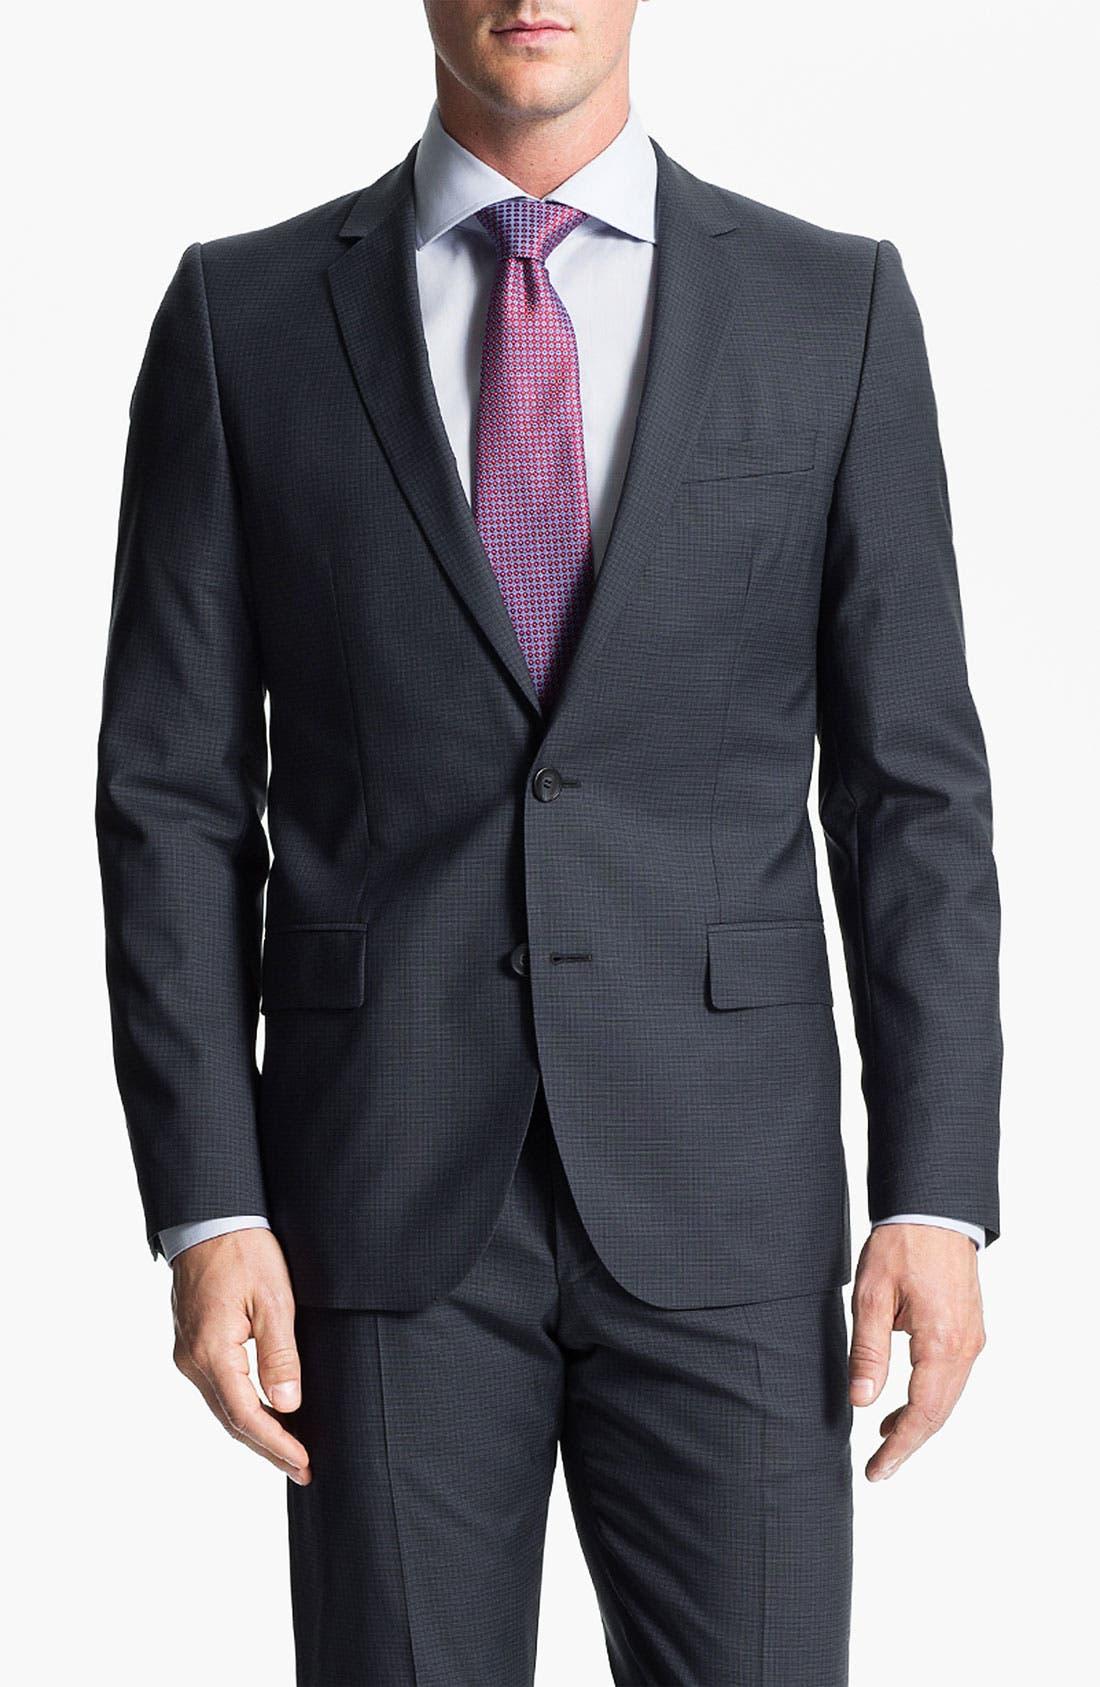 Alternate Image 1 Selected - HUGO 'Amaro/Heise' Trim Fit Suit